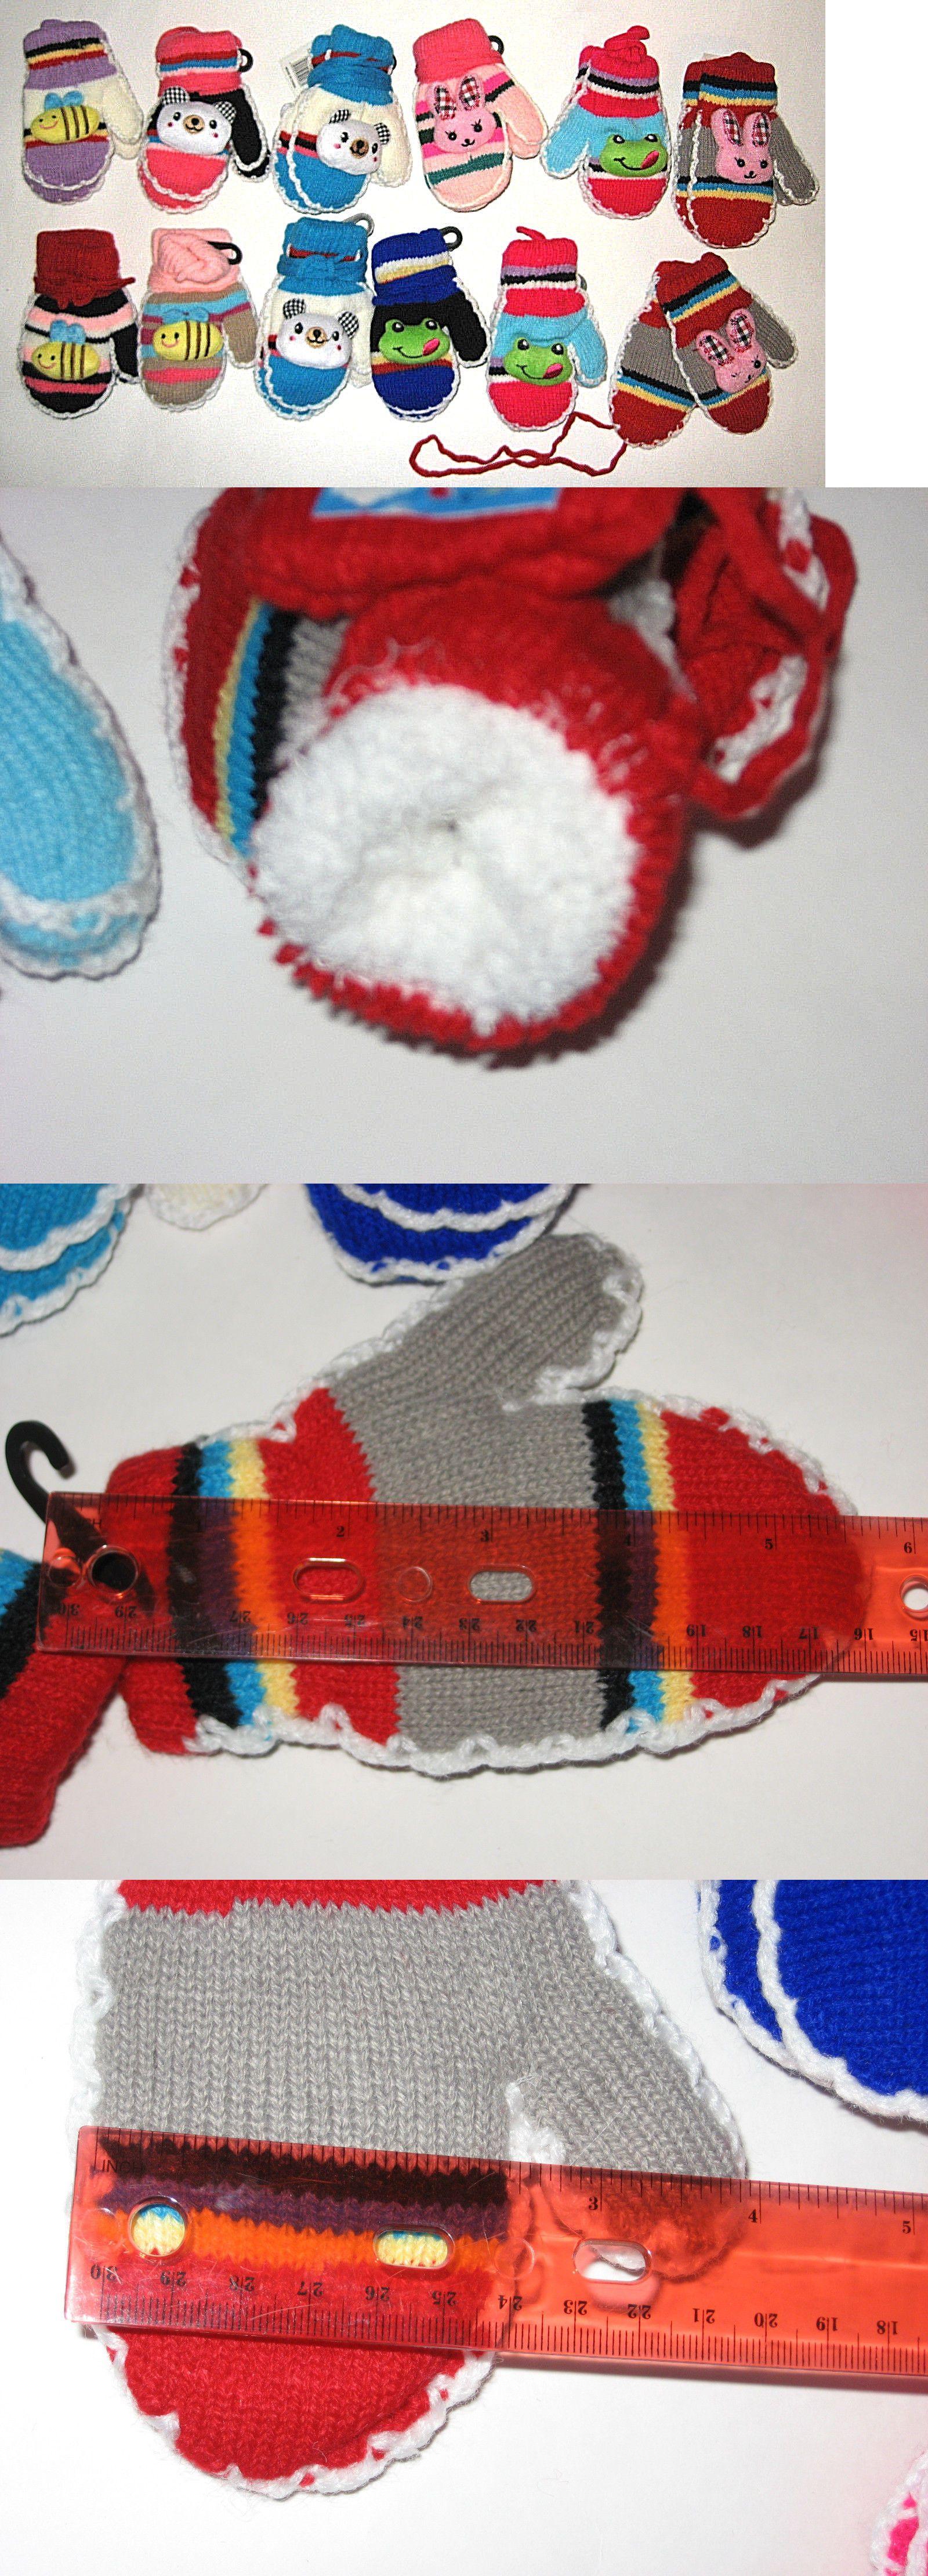 NEW Scoochie Sweet Feet 100/% Merino Wool Baby Hat Mittens Booties Aqua 0-12 Mo/'s